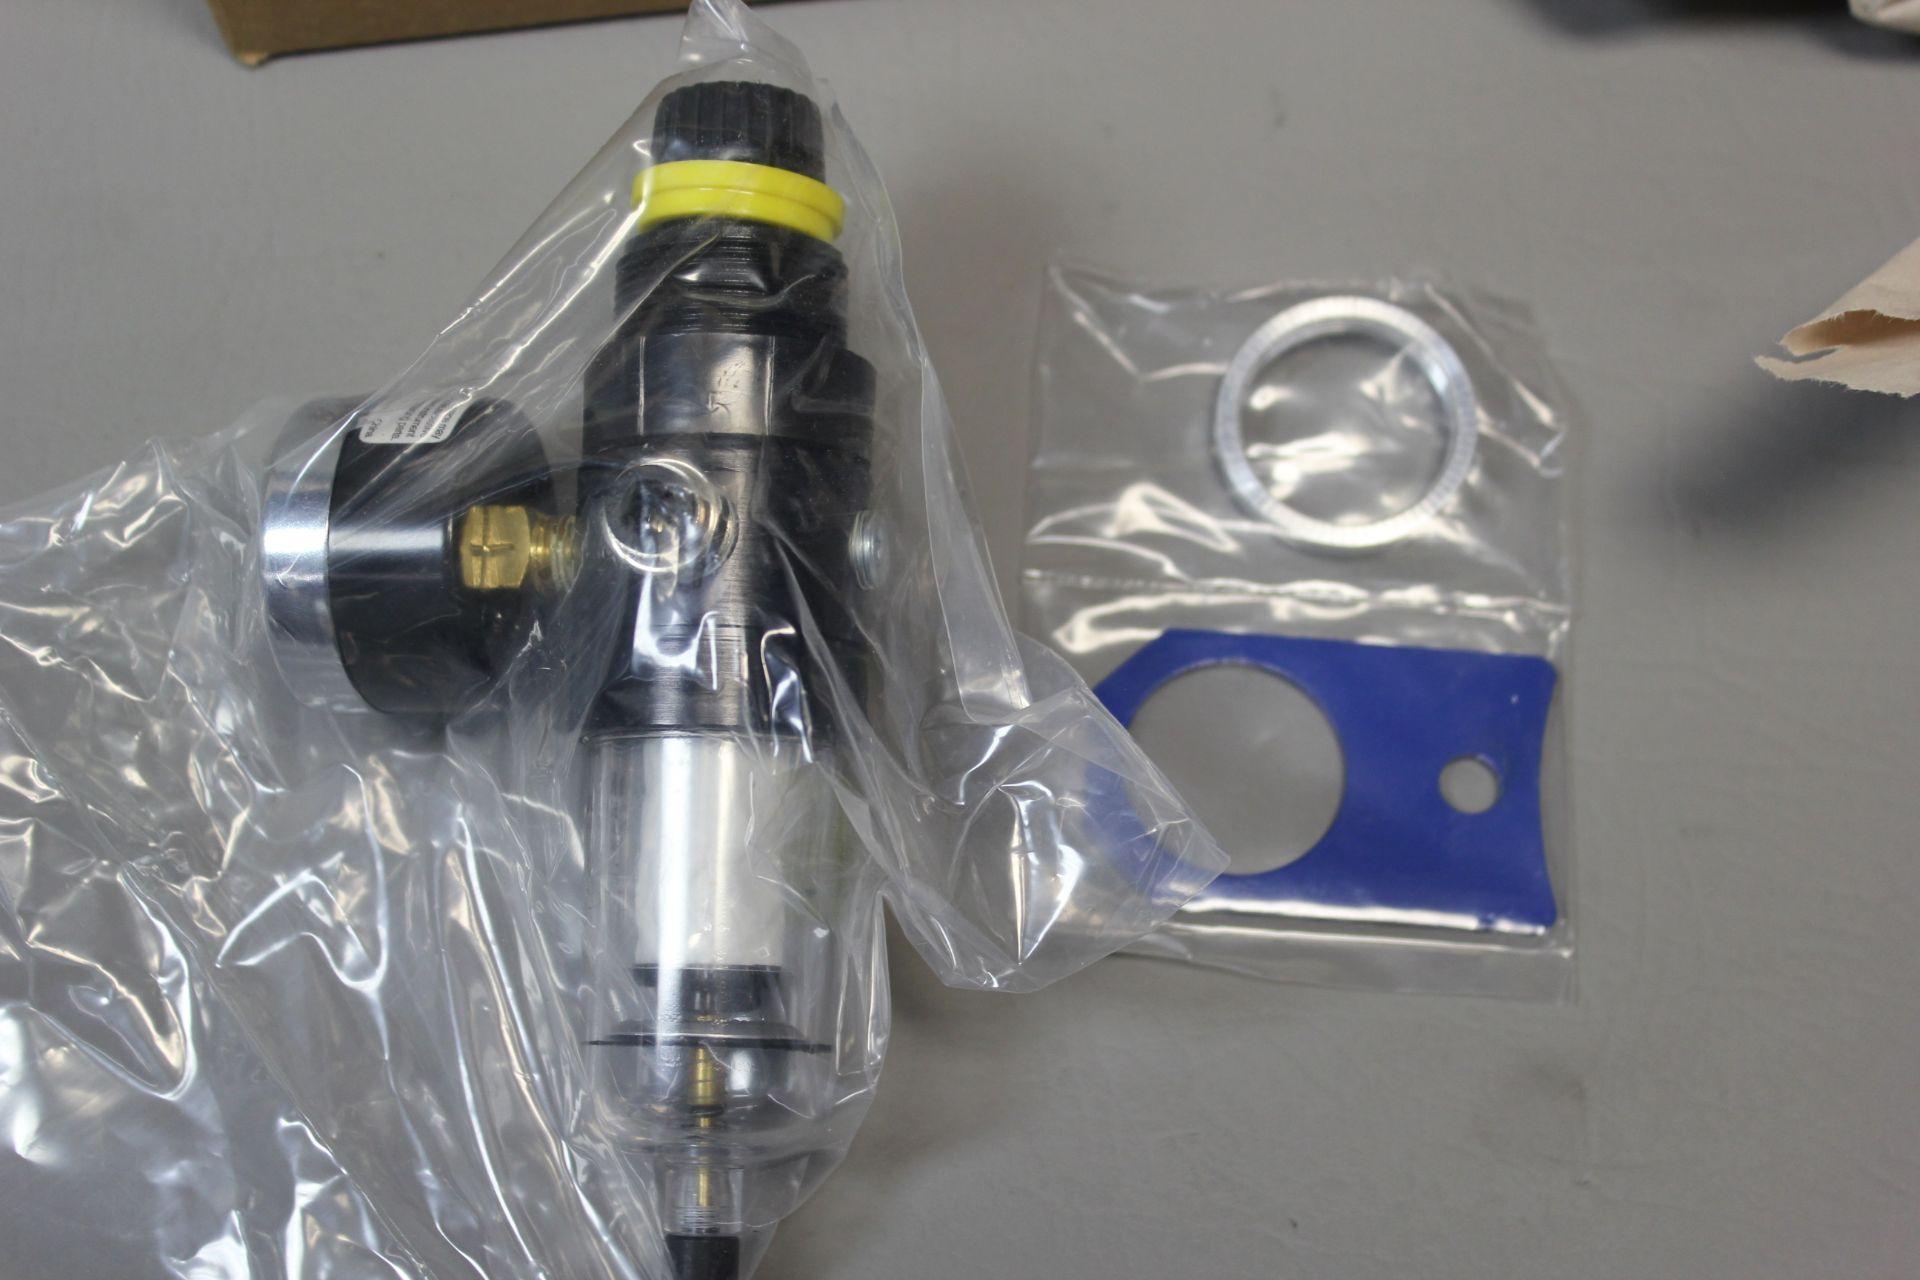 NEW SPIRAX SARCO PRESSURE REGULATOR - Image 2 of 3